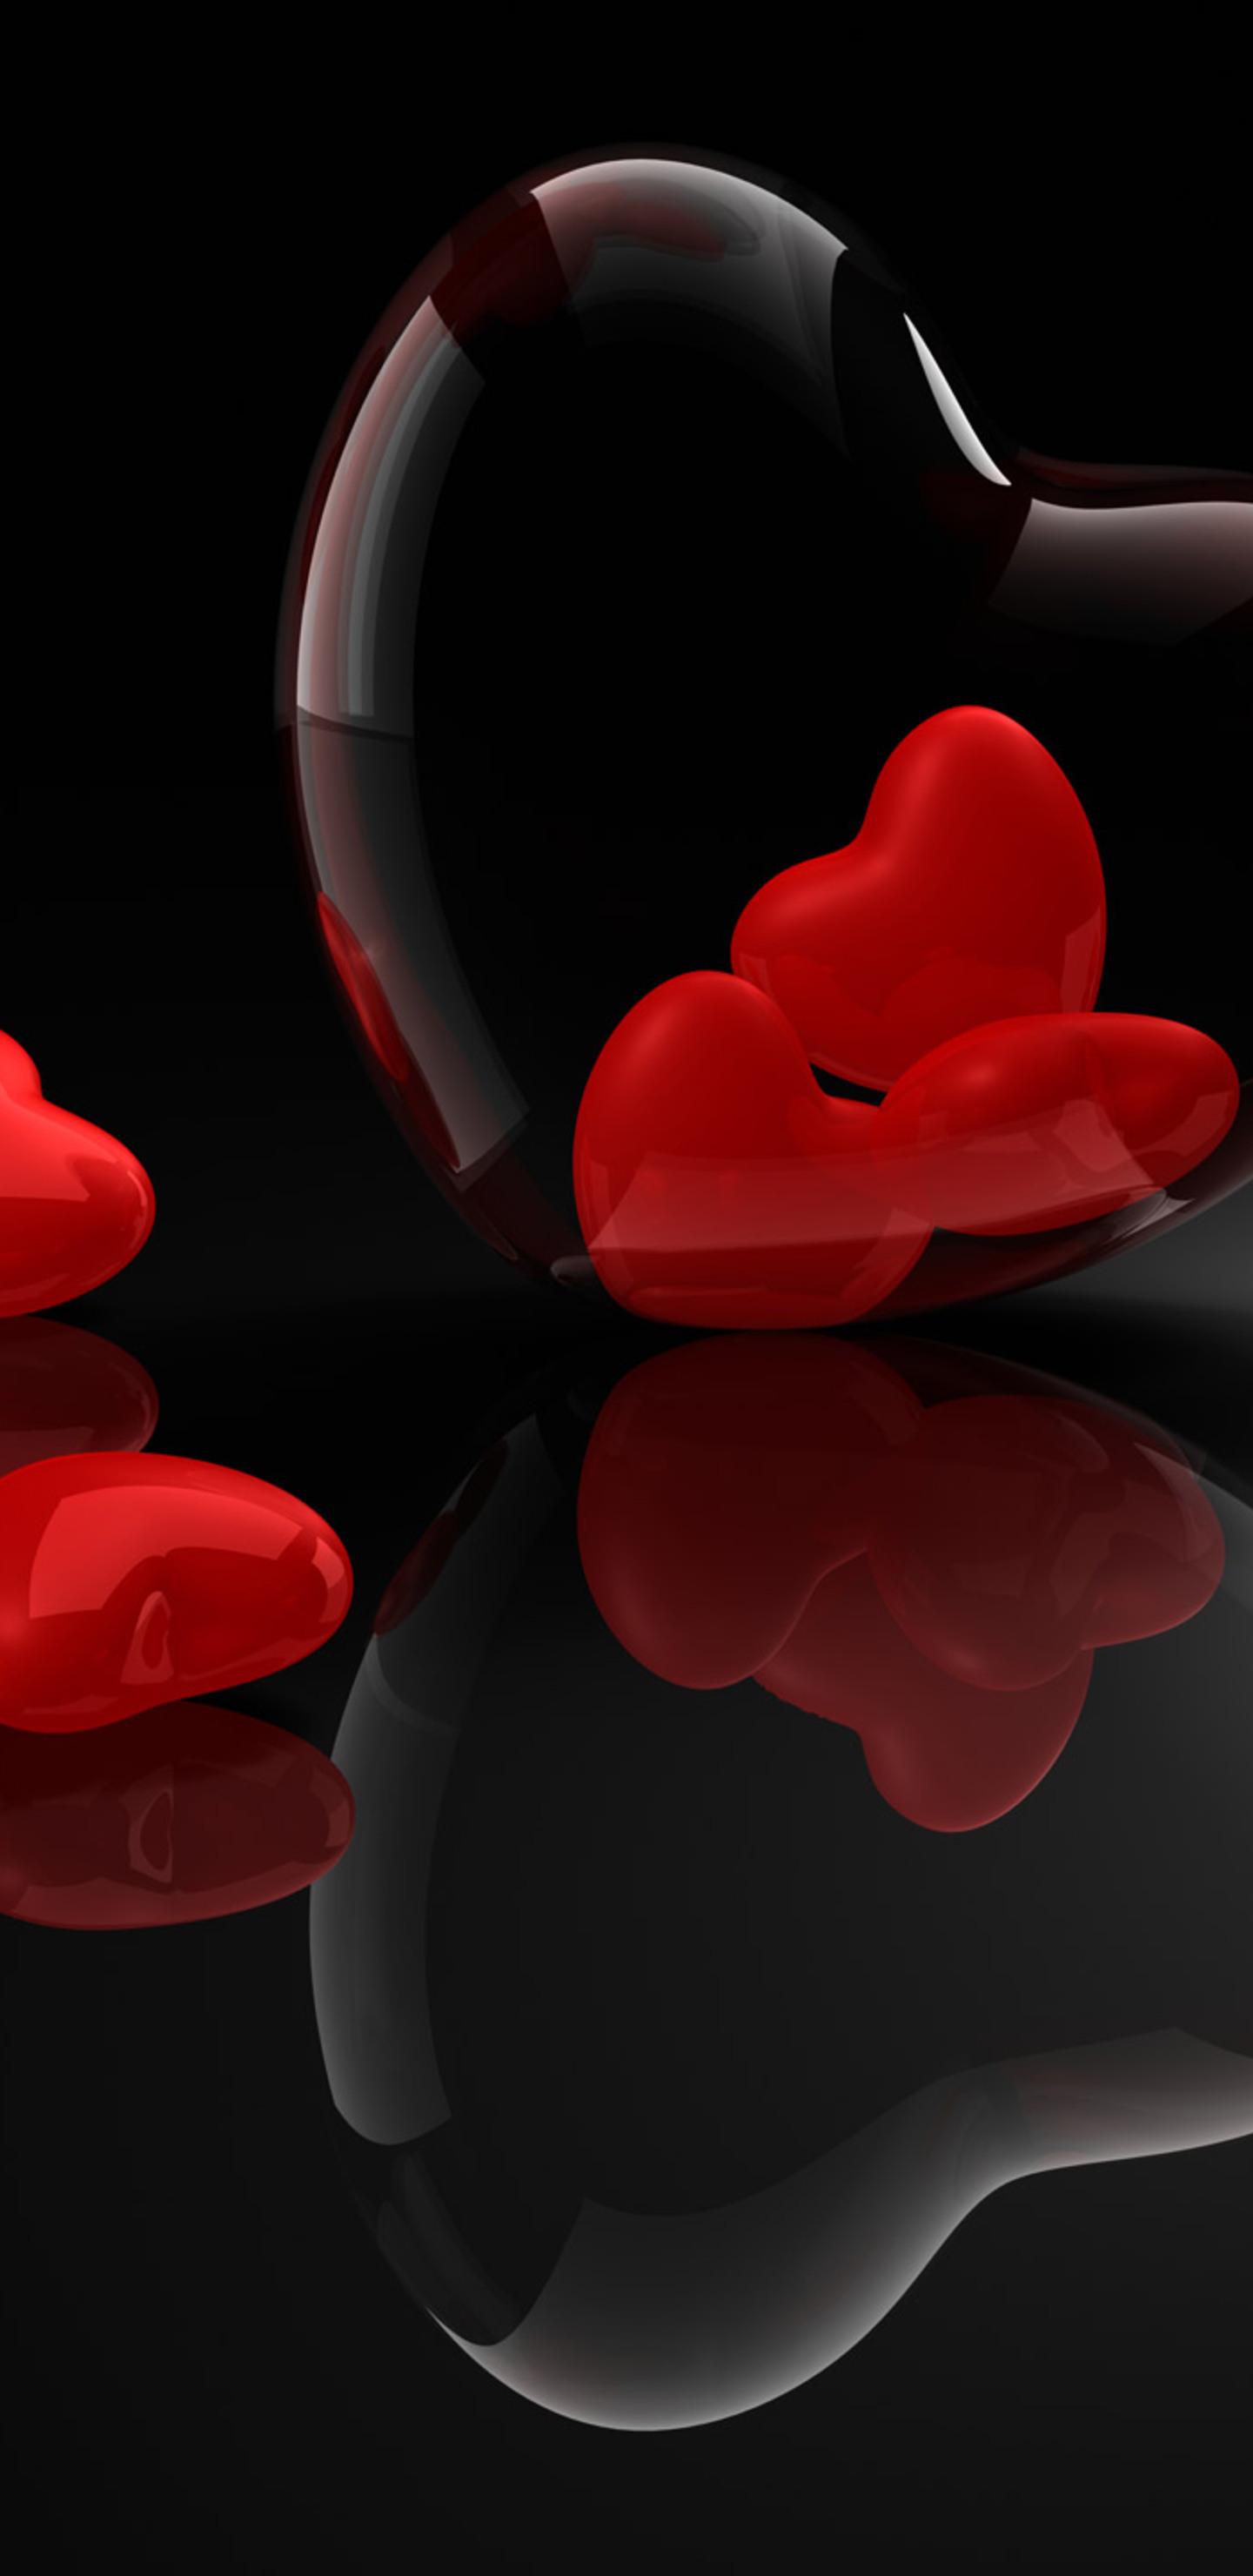 crystal-hearts-5k-new.jpg